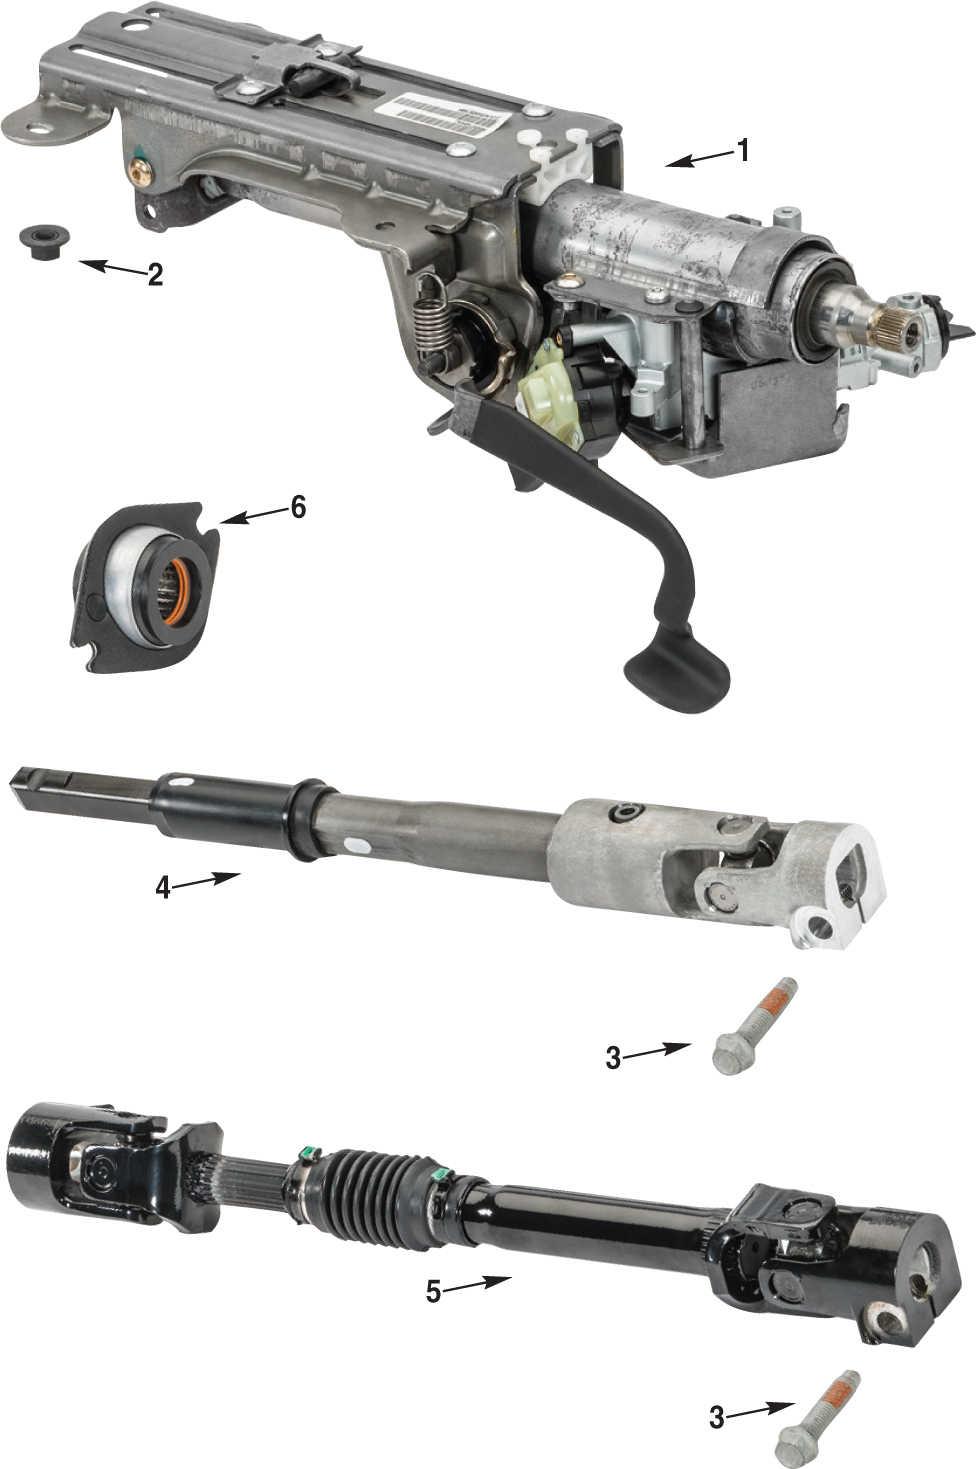 medium resolution of jk wrangler steering column wiring diagram jk free 1990 jeep cherokee steering column wiring diagram 1990